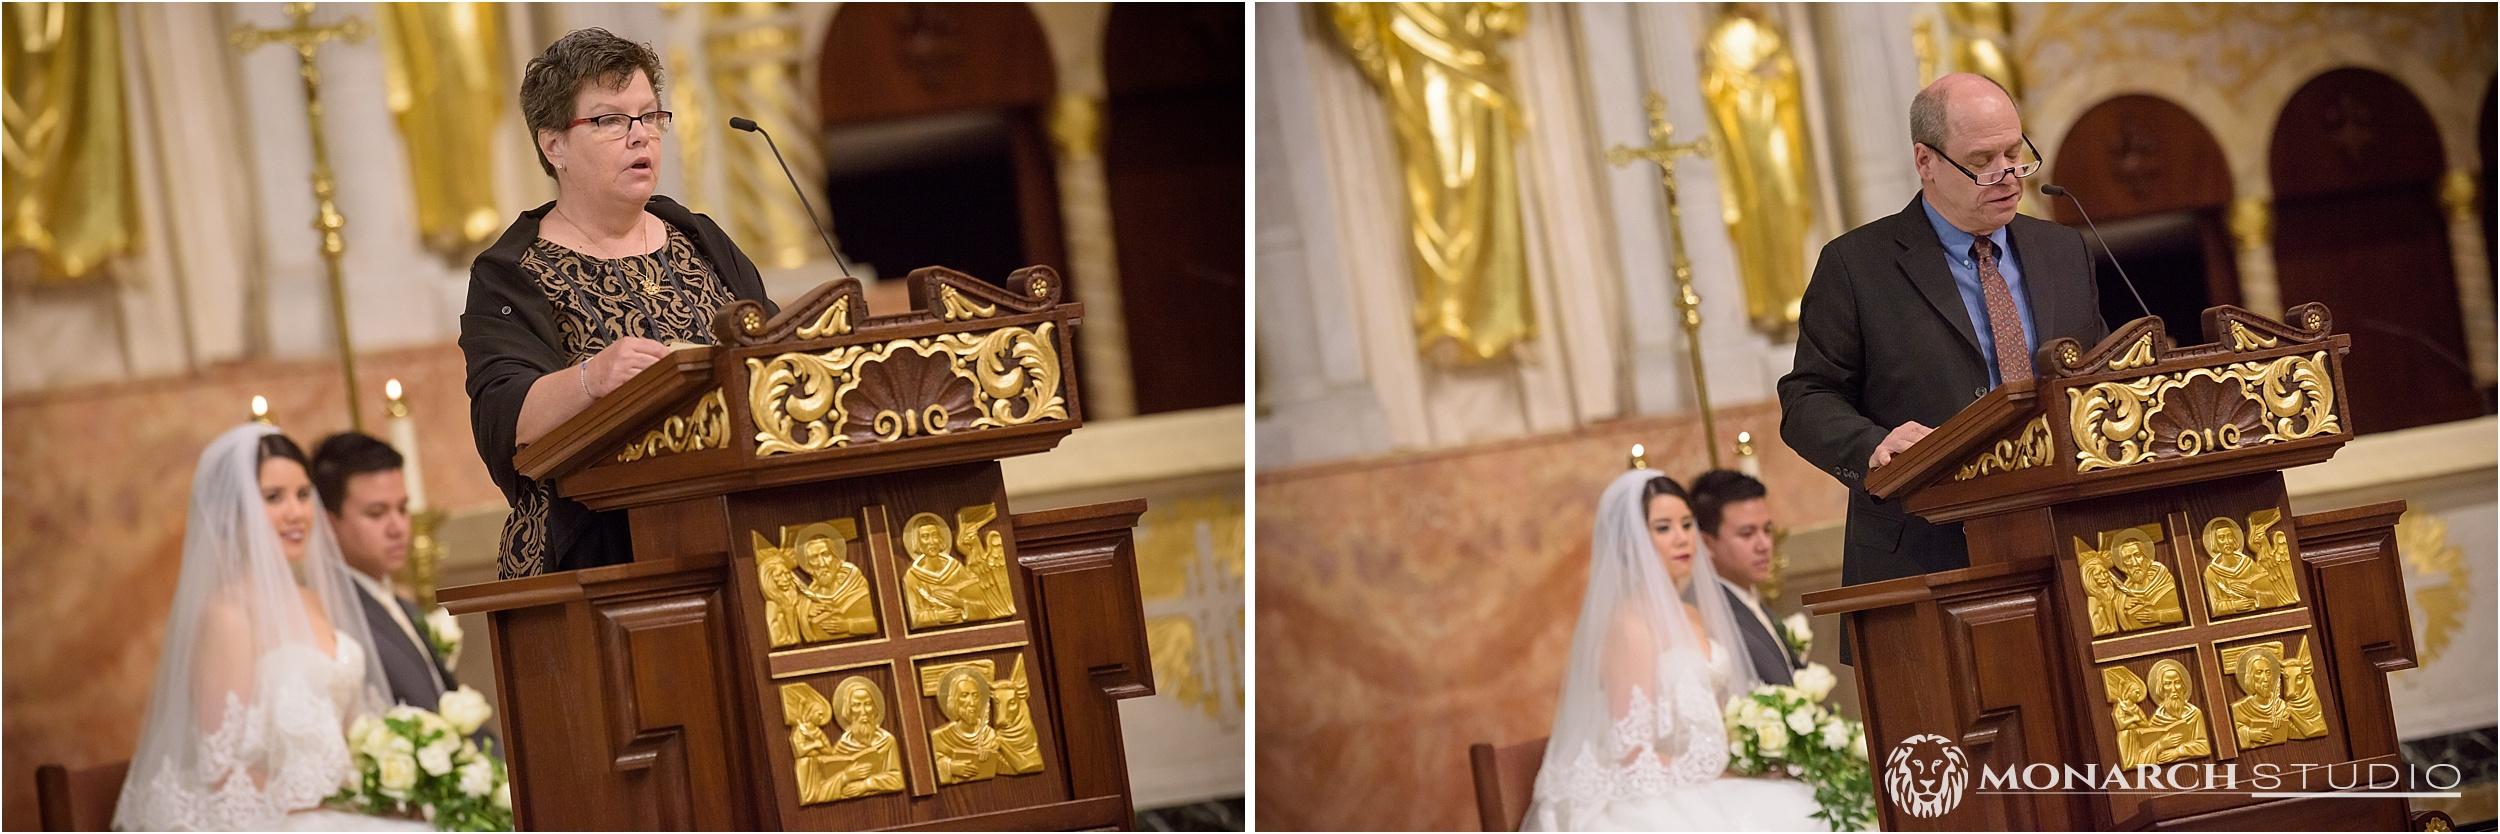 wedding-photographer-in-st-augustine-florida-treasury-043.jpg